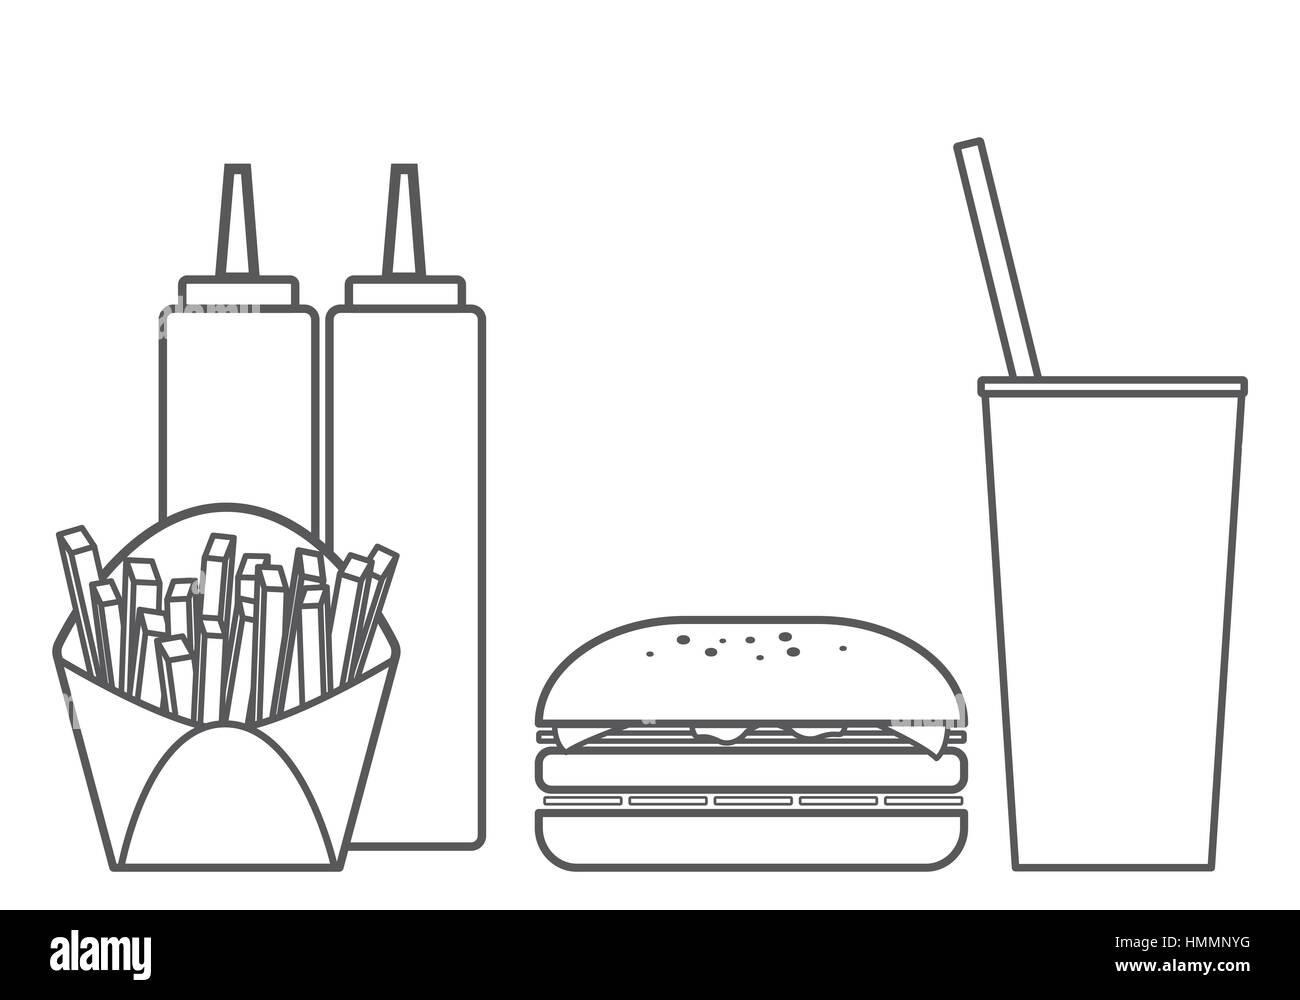 Fast Food Hamburger Vector Set - Stock Image